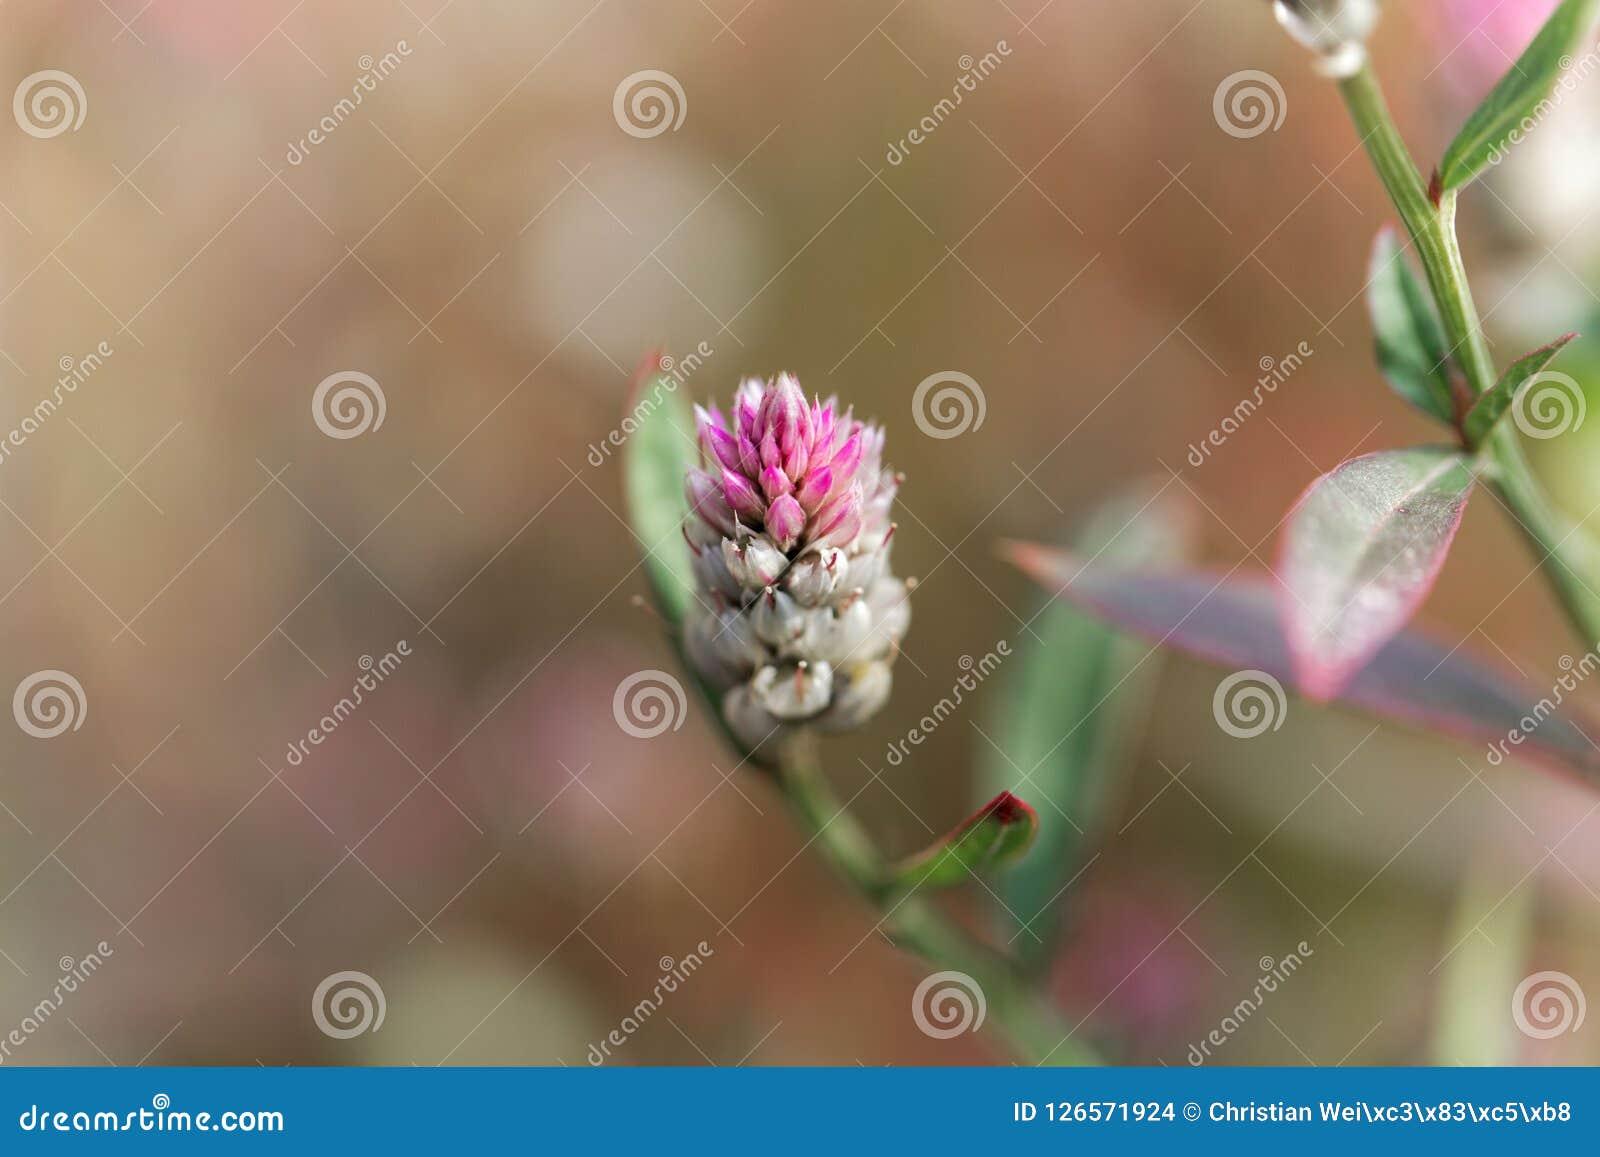 Plumed Cockscomb Flower Celosia Argentea Stock Photo Image Of